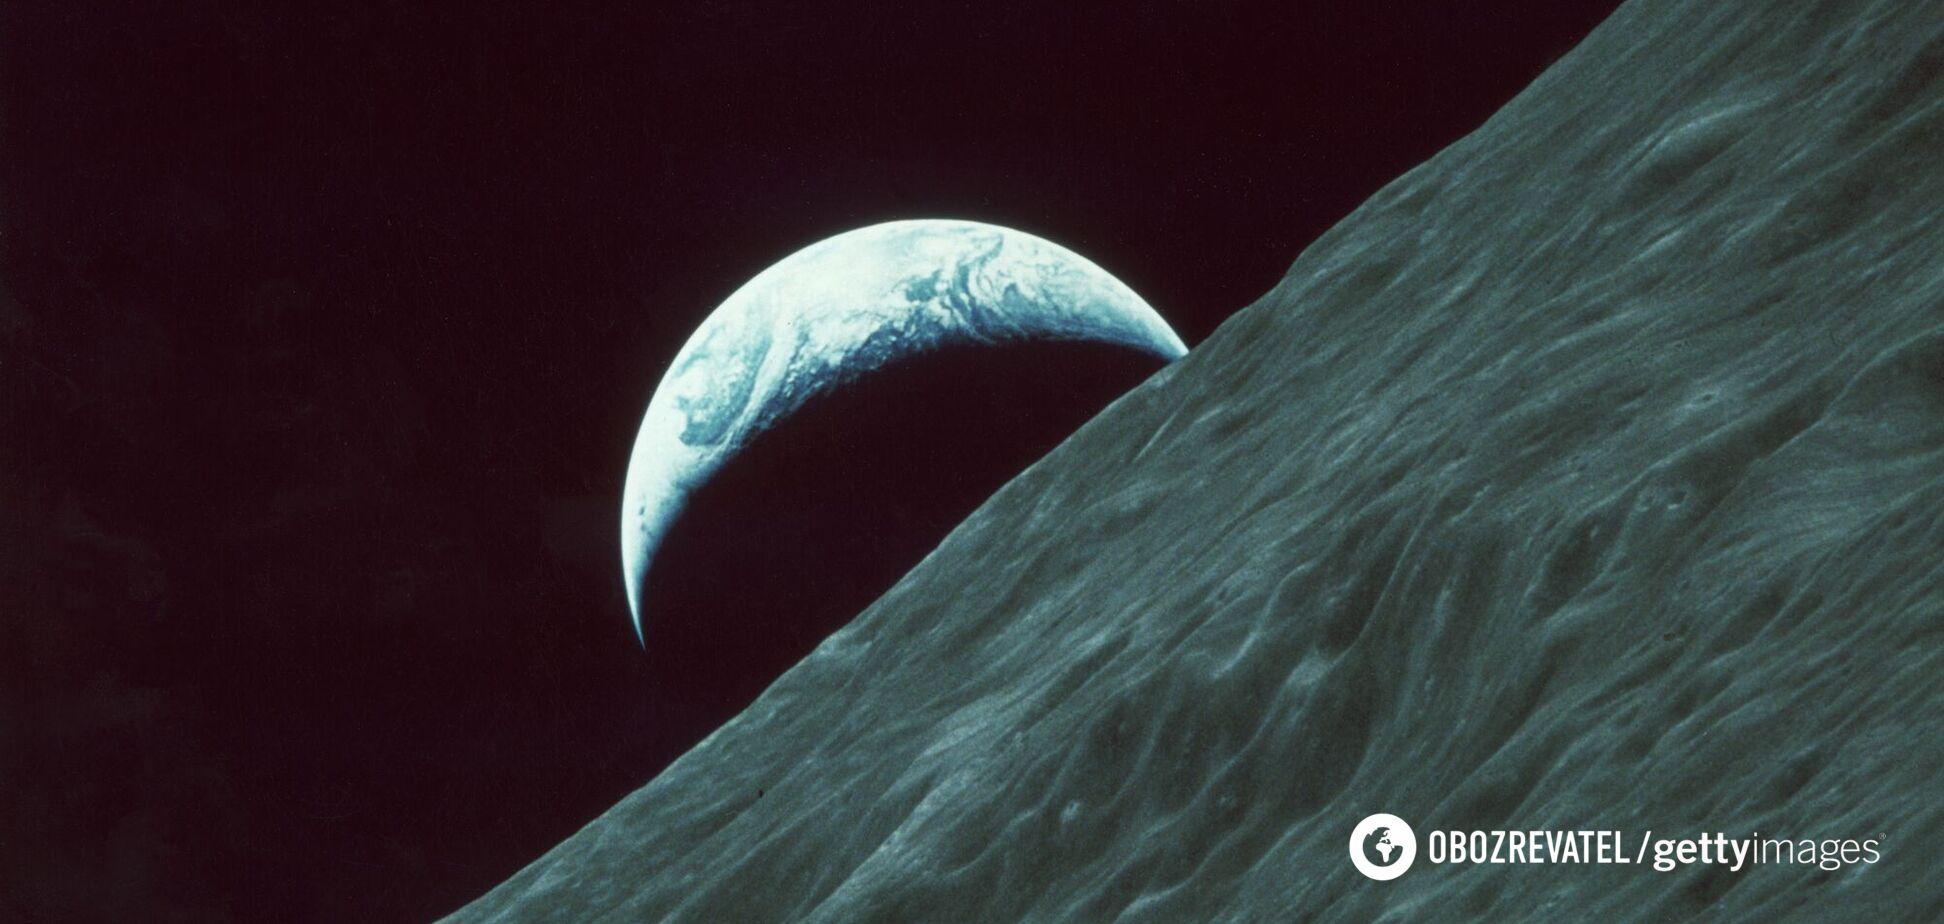 Найдена планета земного типа со своей атмосферой